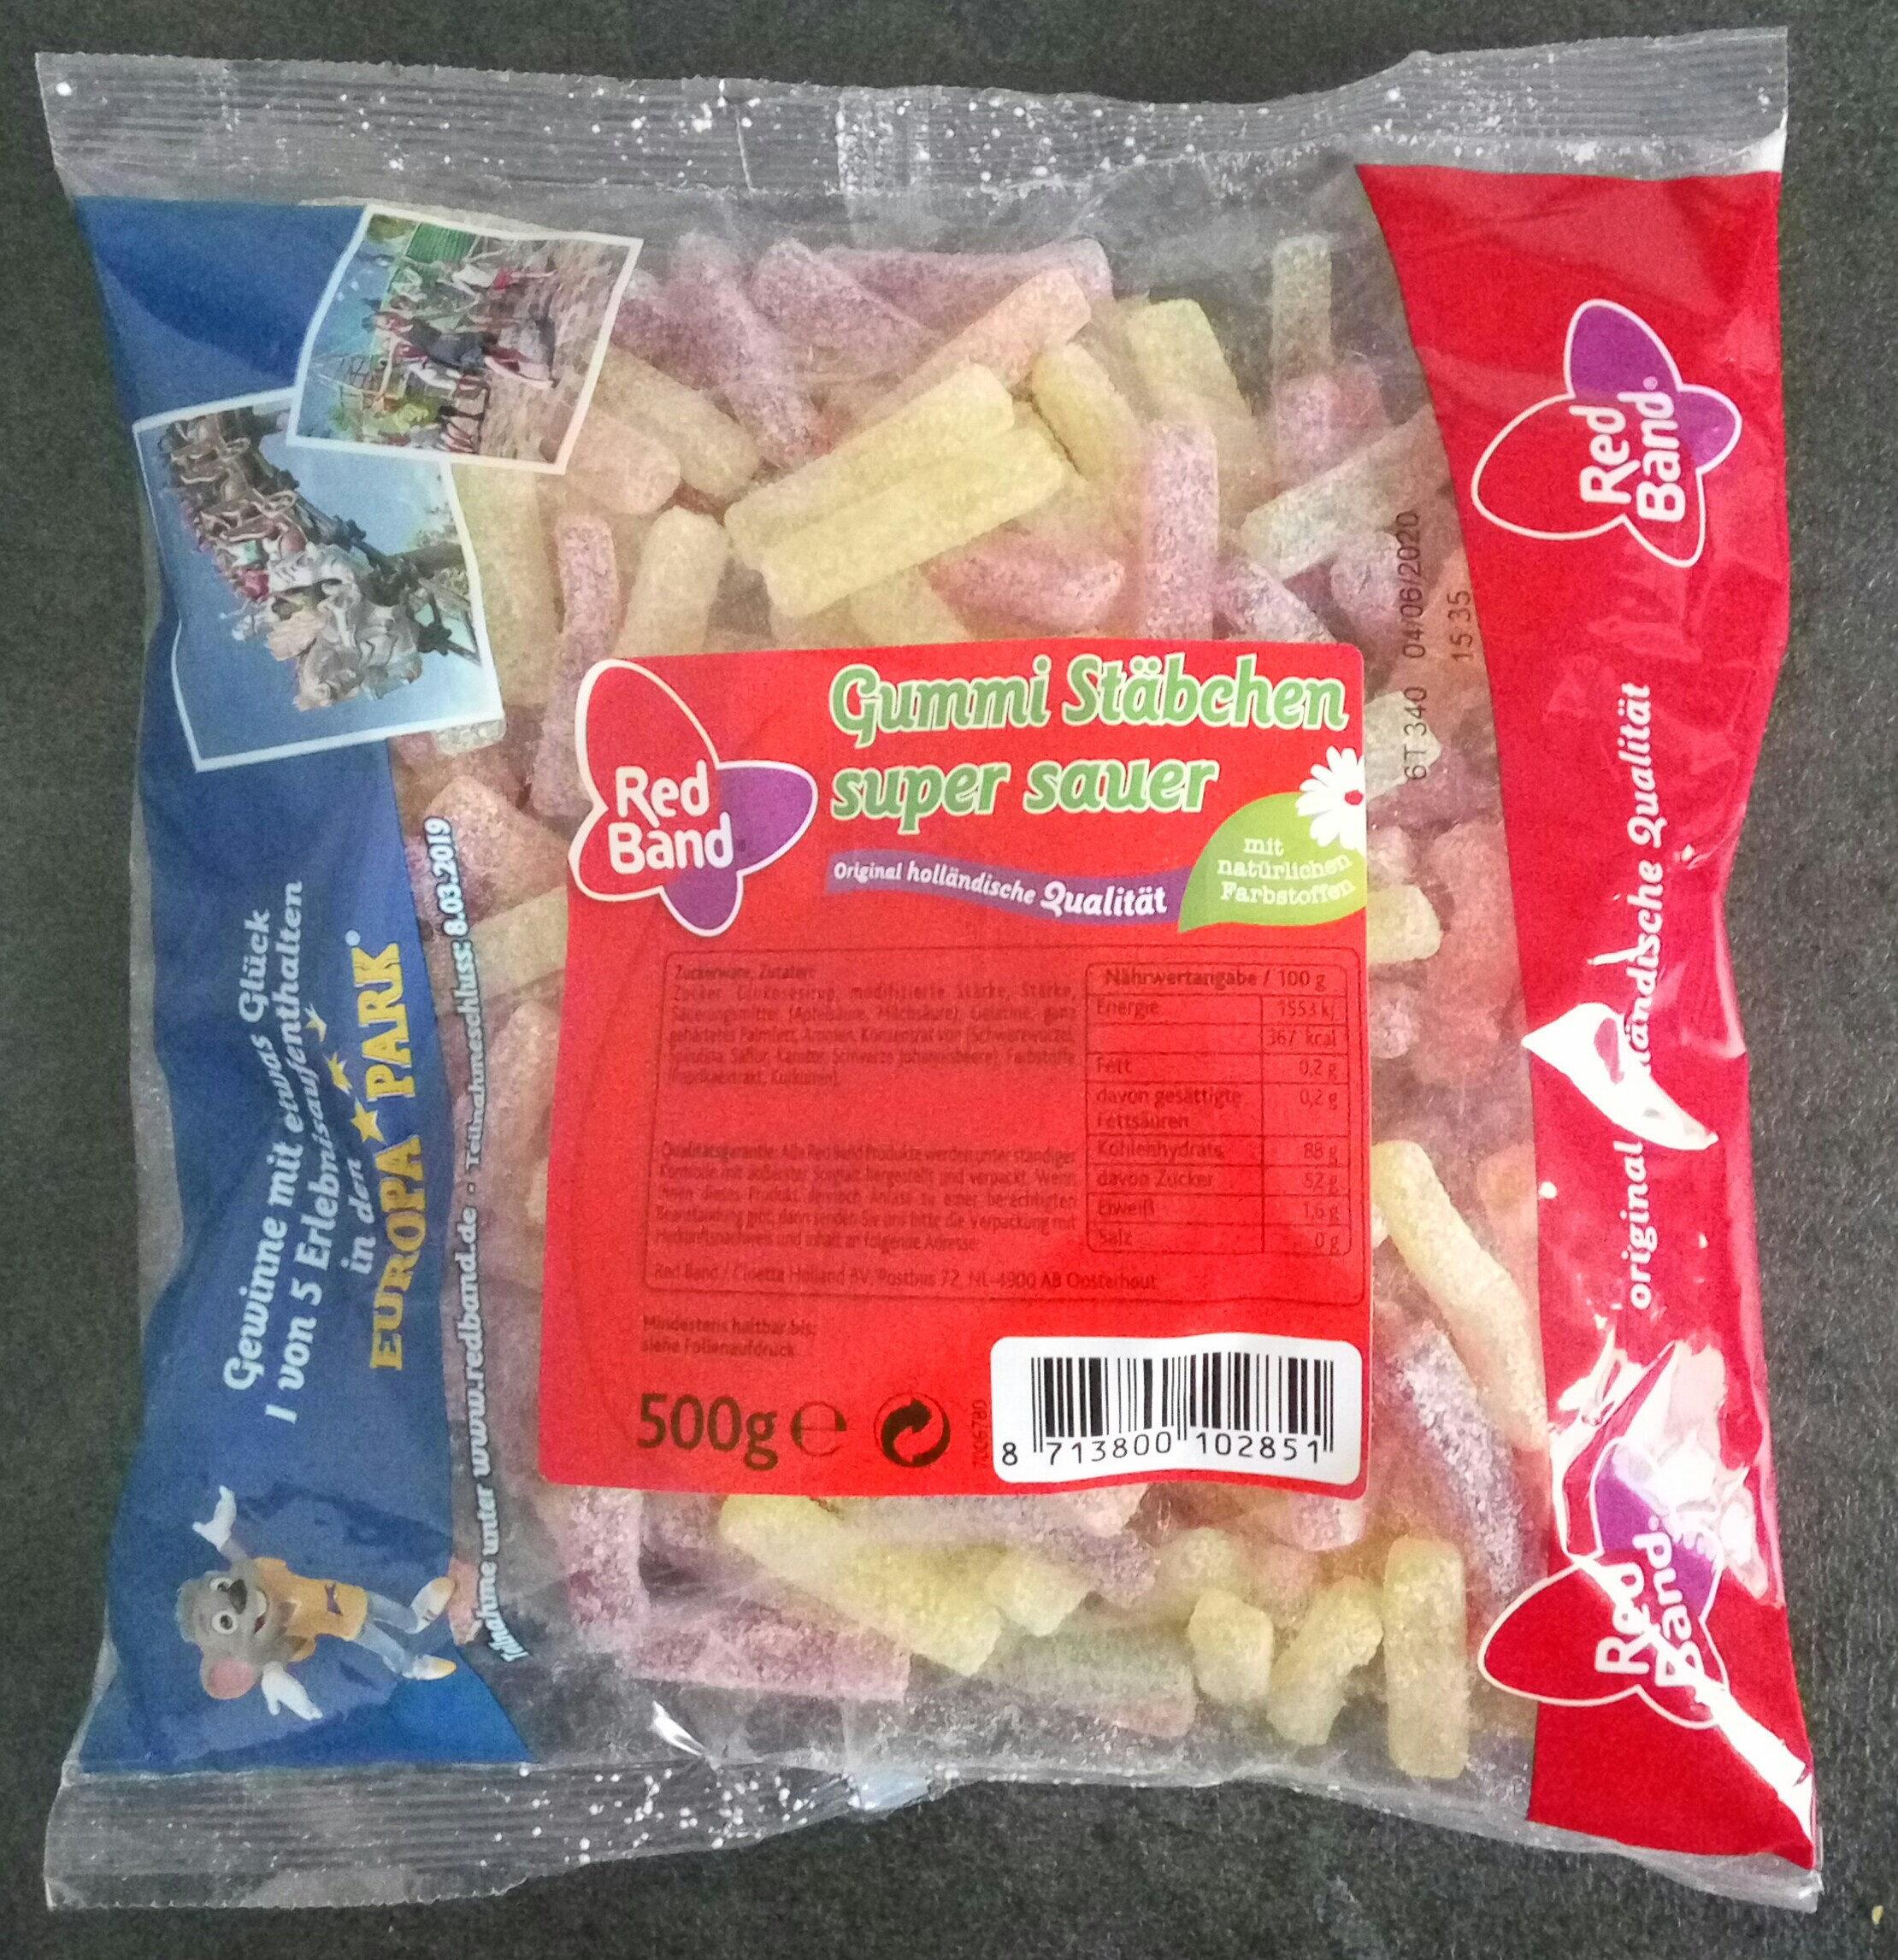 Gummi Stäbchen super sauer - Produkt - de